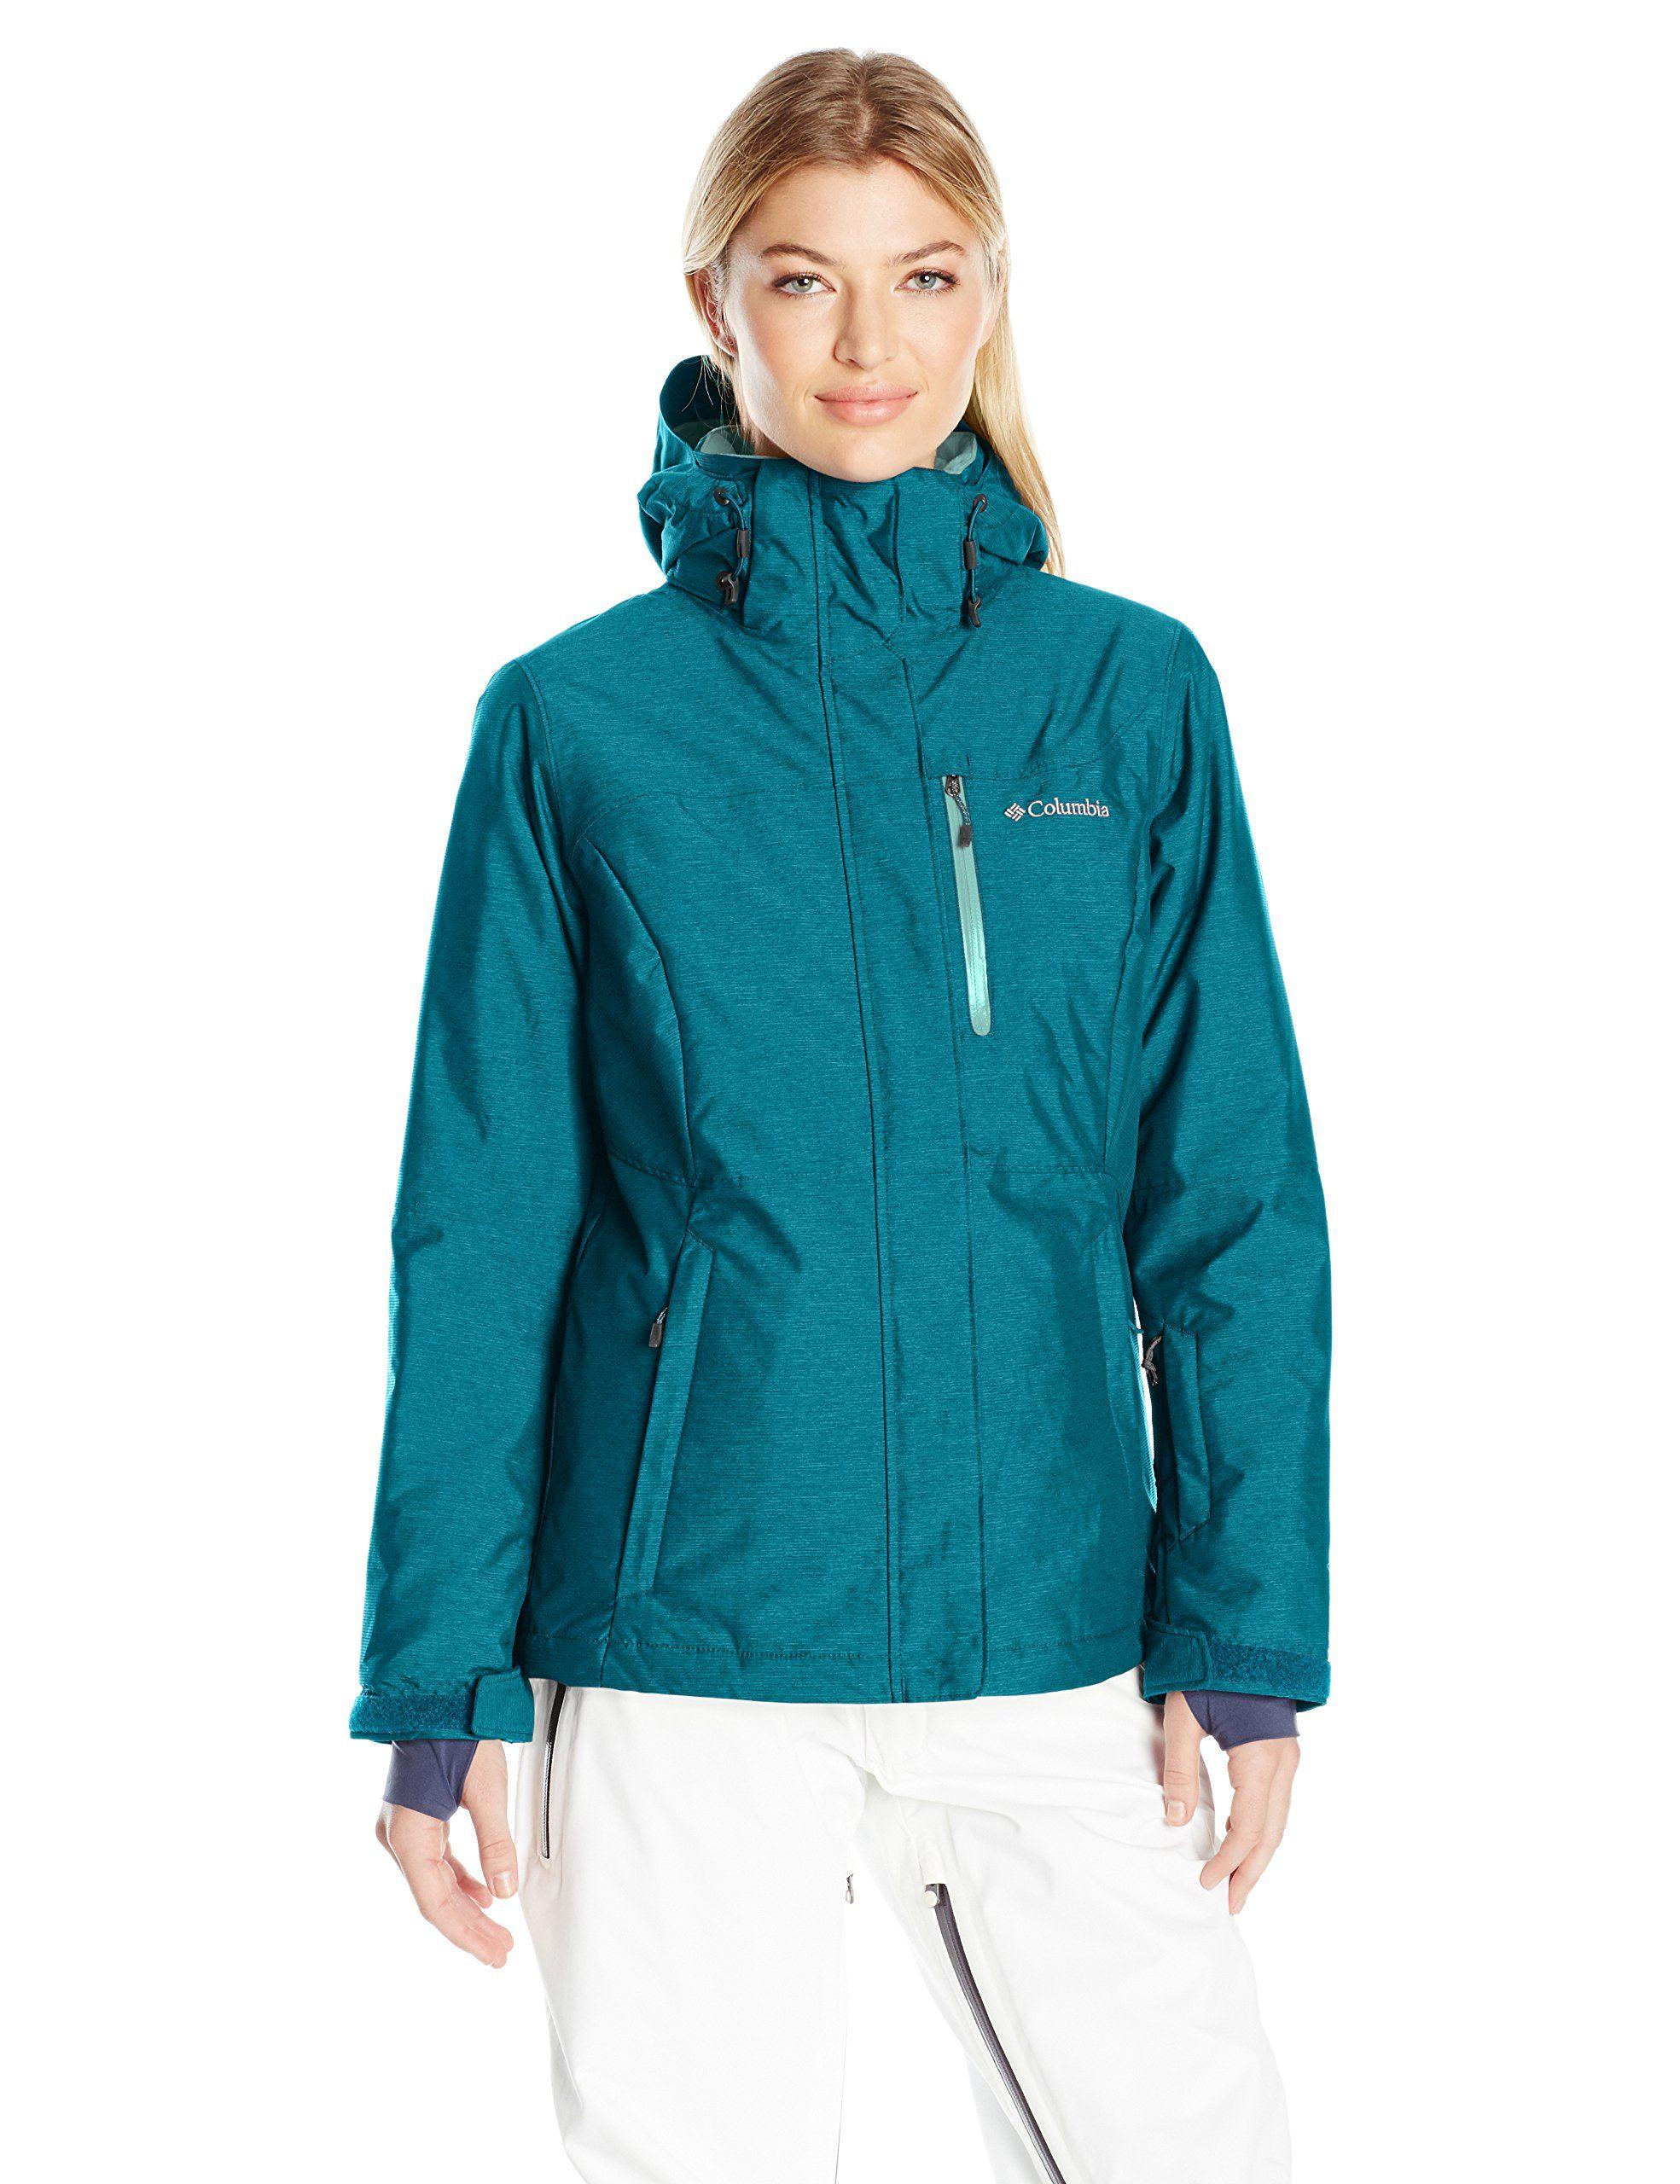 7022530bf2474 Columbia Women s Alpine Action Omni-Heat Jacket